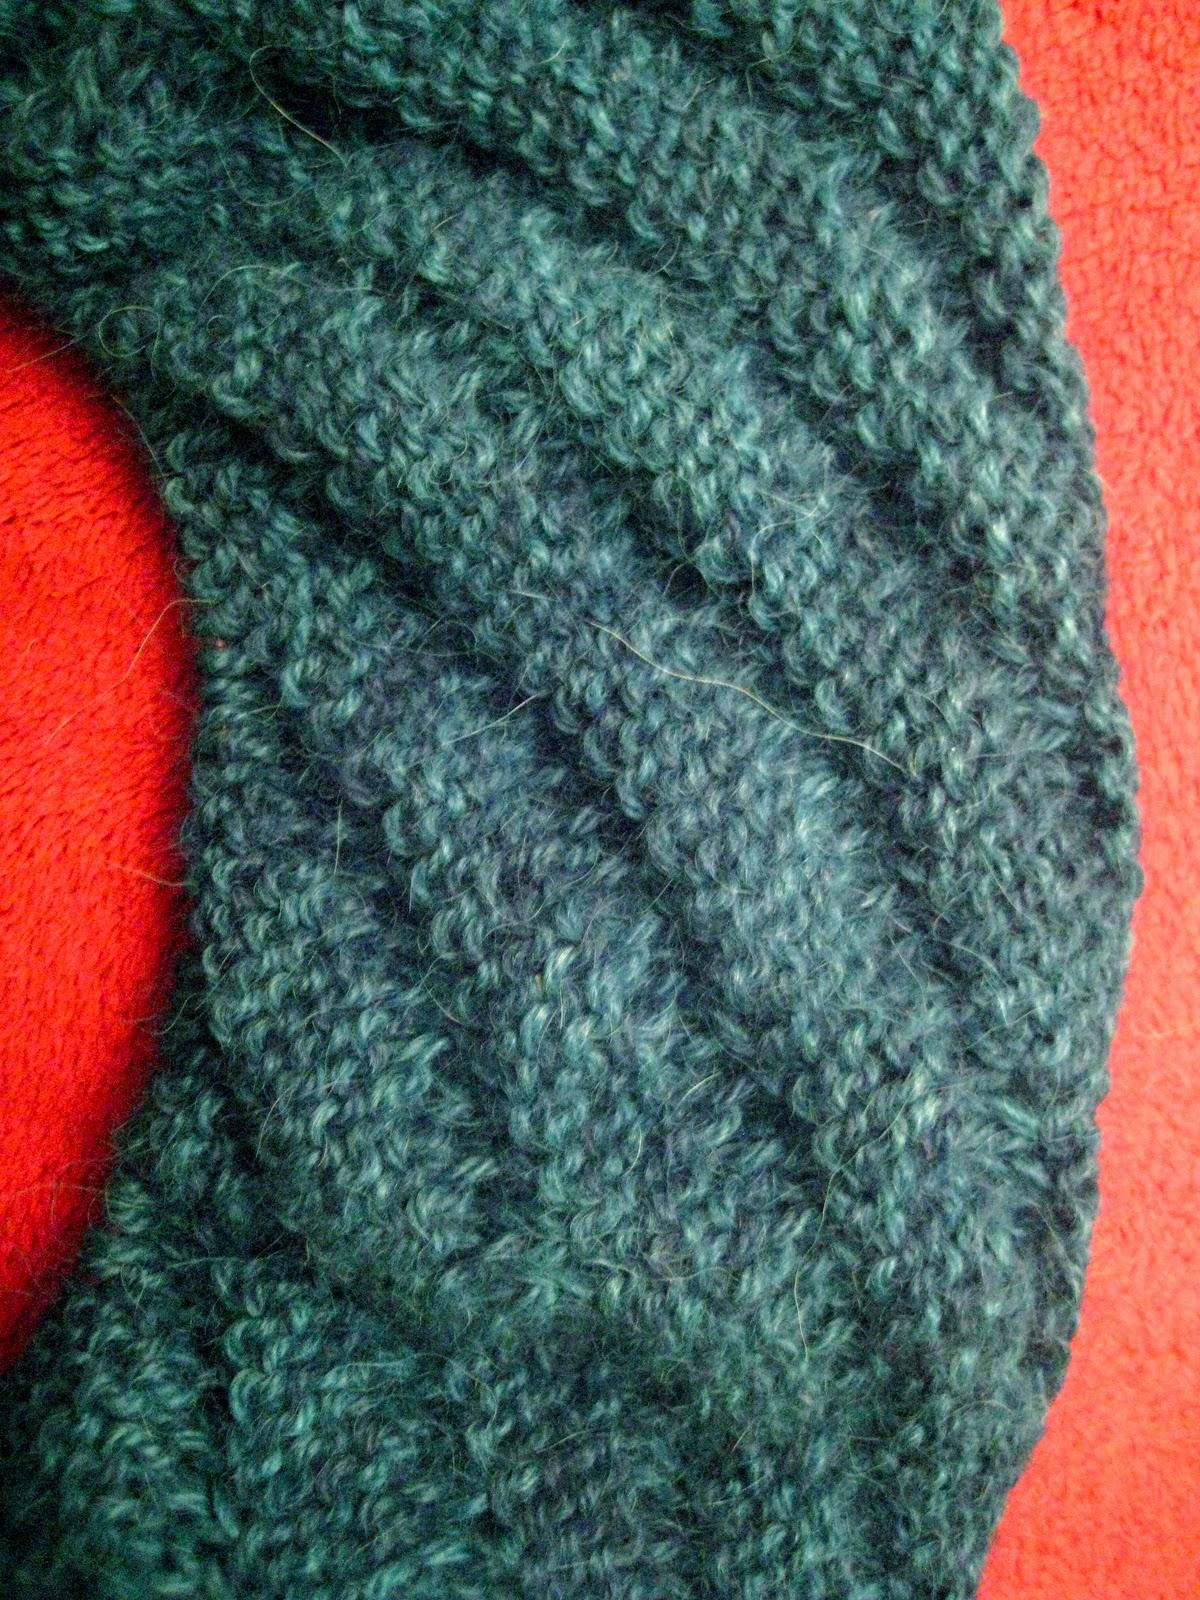 Destiknitions Diagonal Rib Infinity Scarf From Stitch Es Day 4